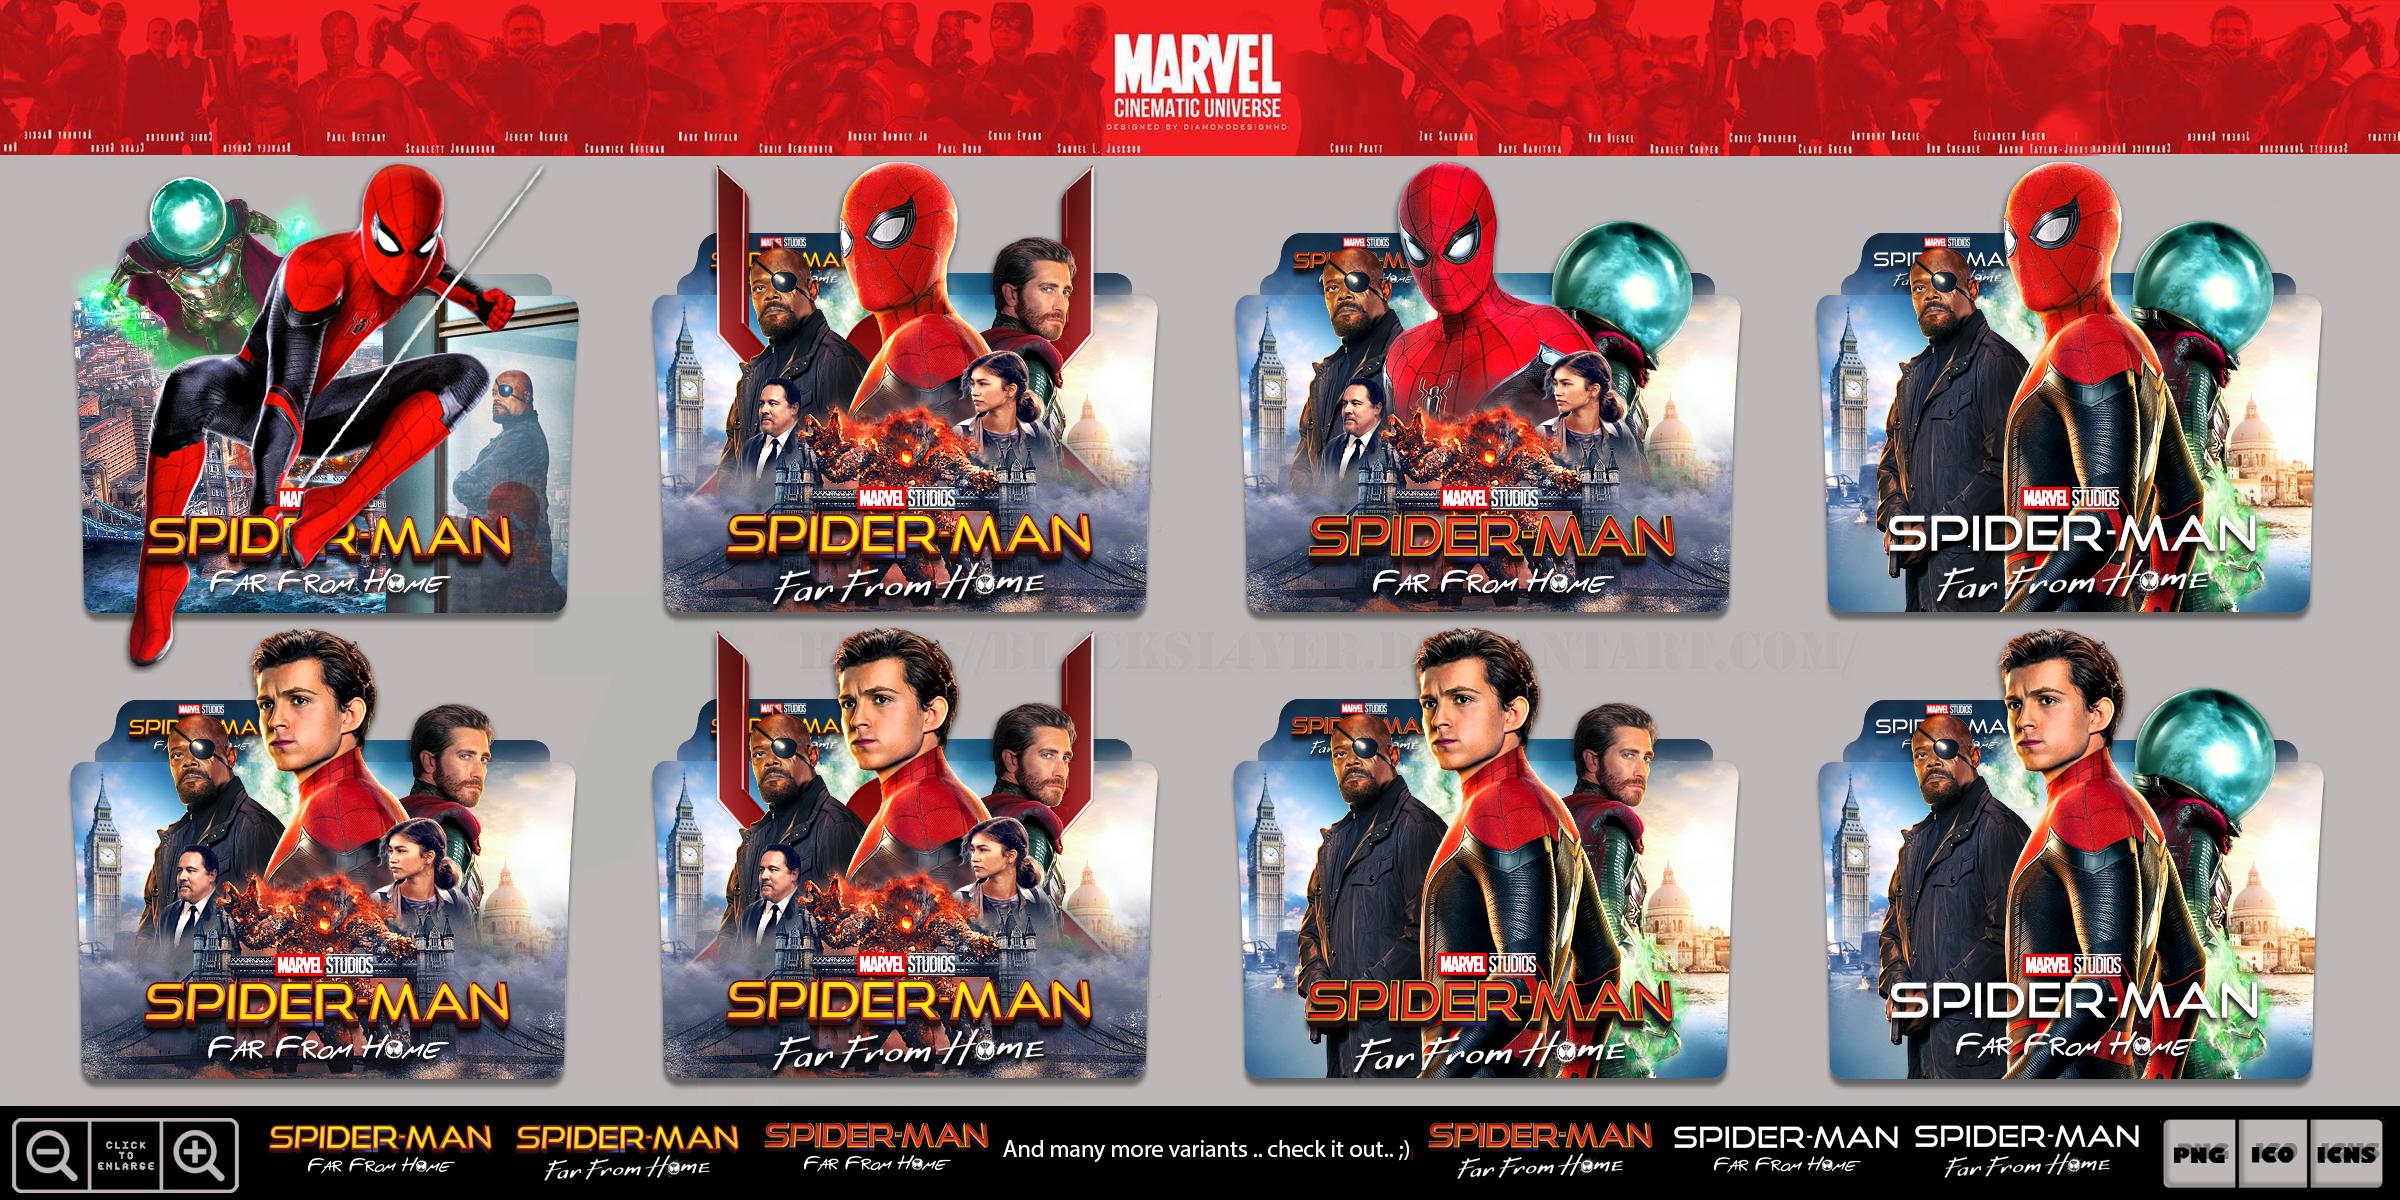 Spider Man Far From Home 2019 Folder Icon Pack By Bl4cksl4yer On Deviantart